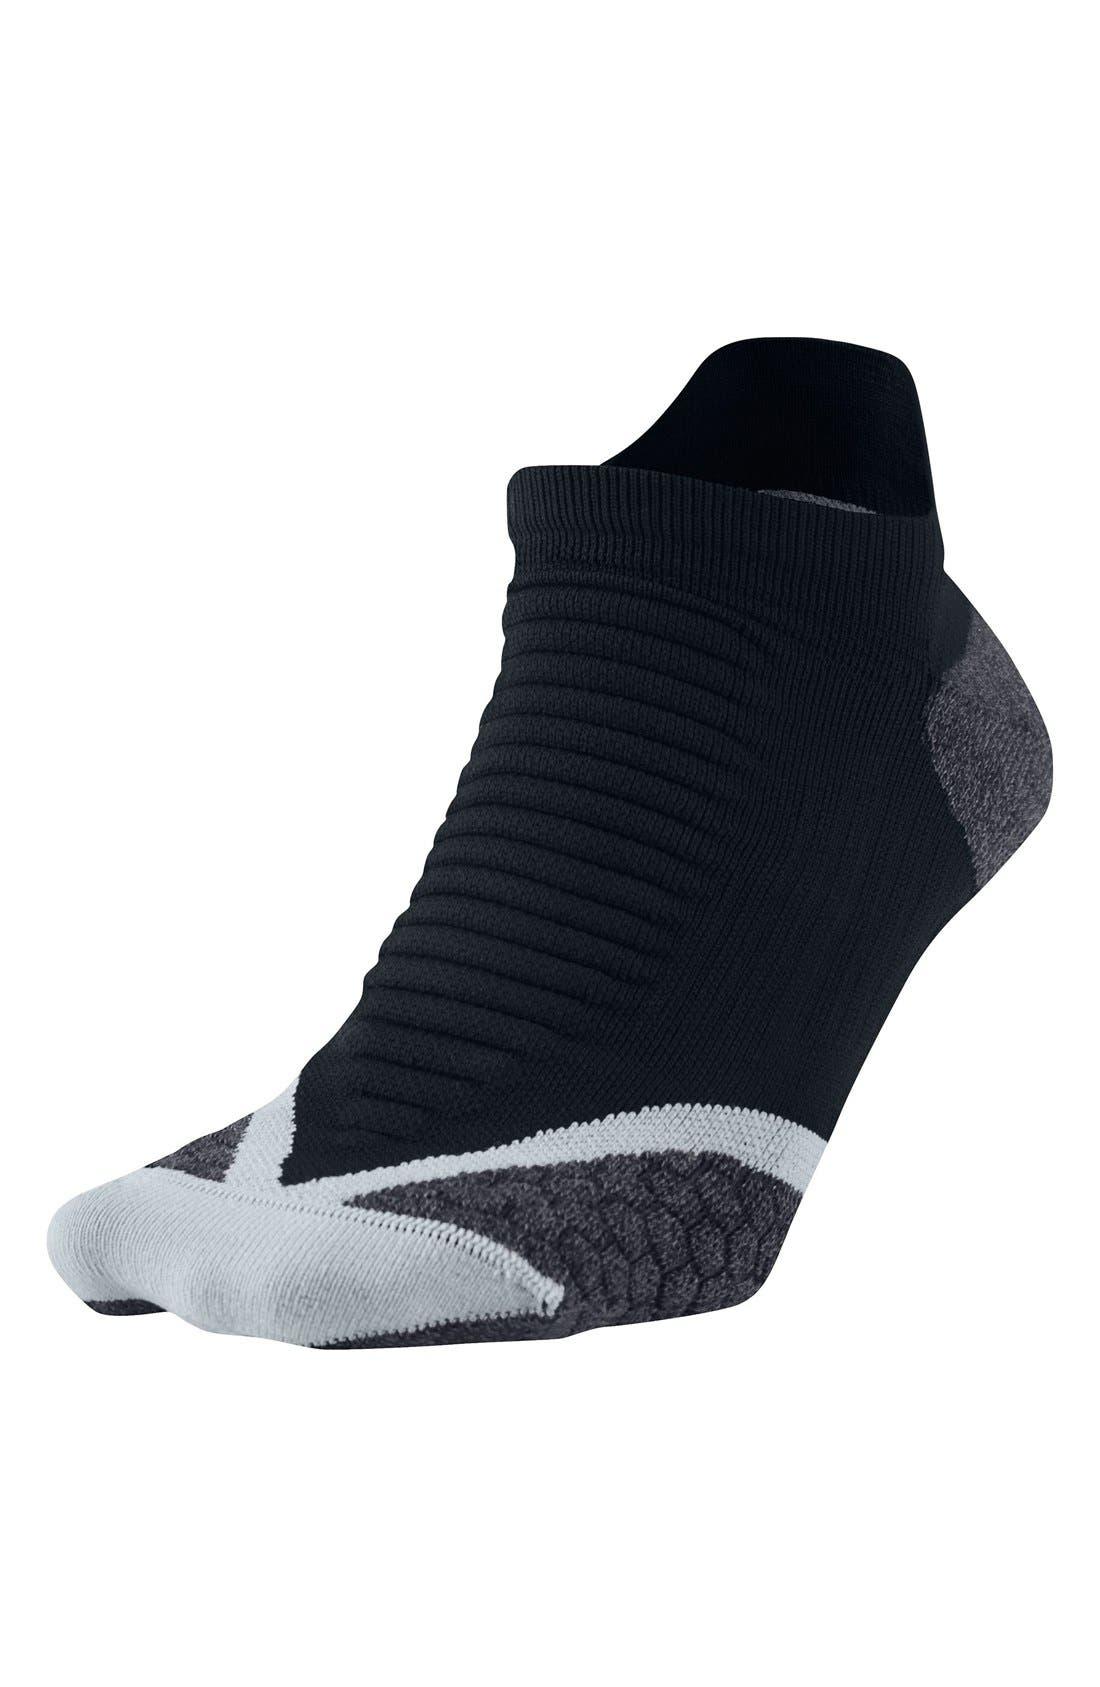 Elite Cushioned No-Show Tab Running Socks,                         Main,                         color, 010